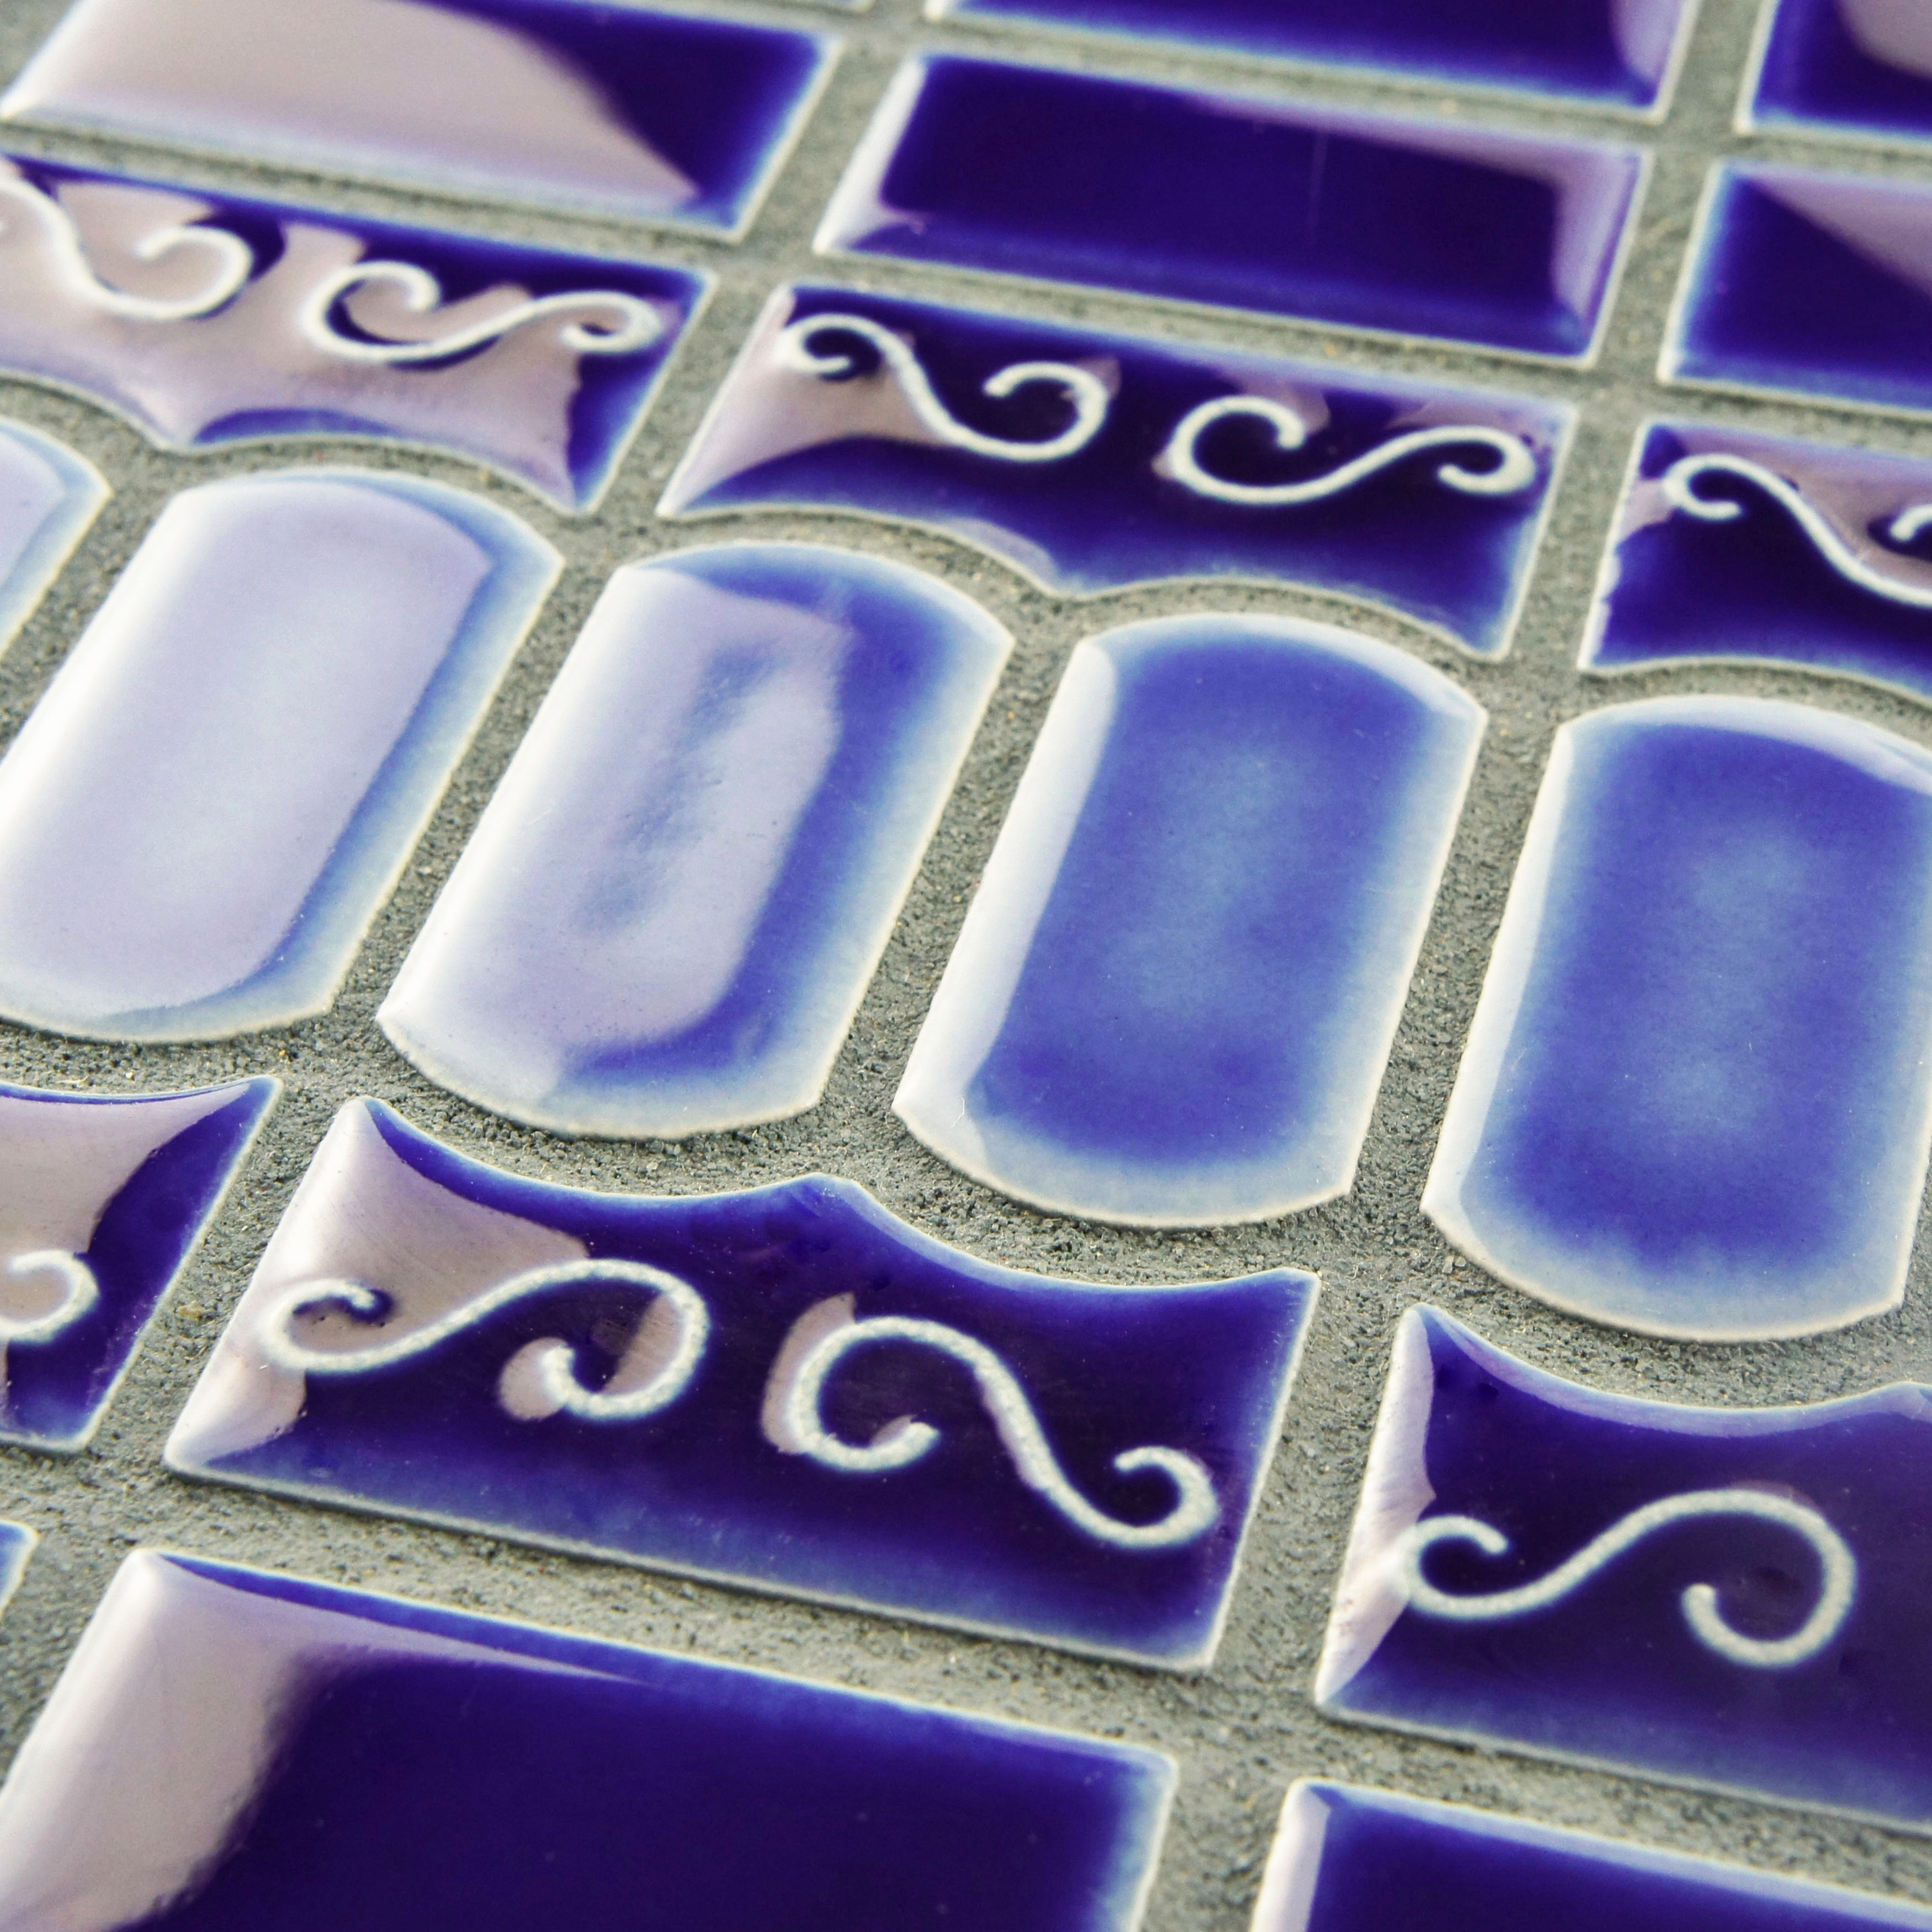 SomerTile 11.5x13.125-inch Modena Cobalt Blue Porcelain Mosaic Floor ...